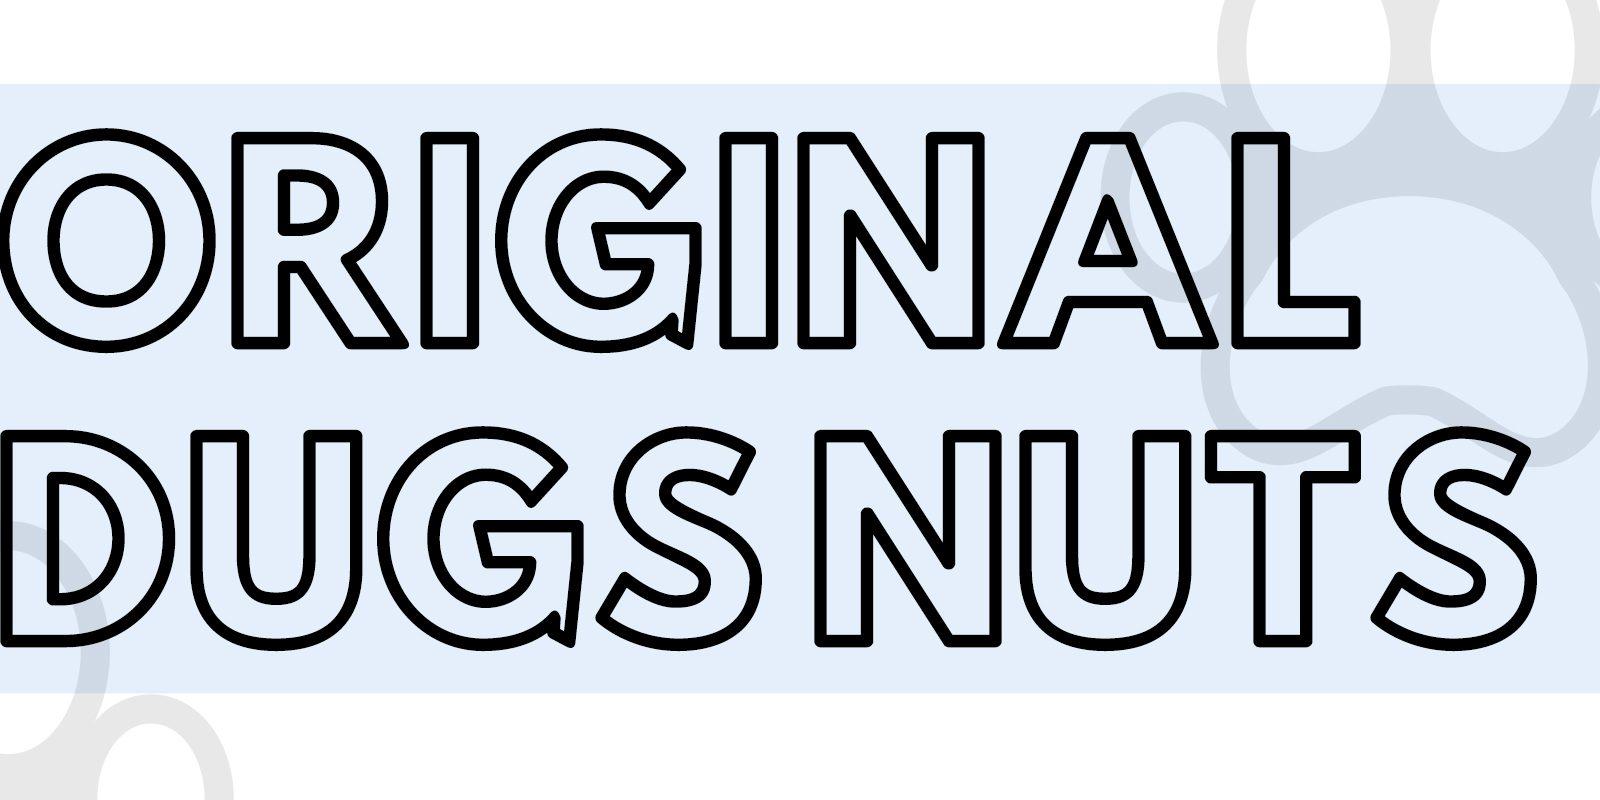 Original Dugs Nuts